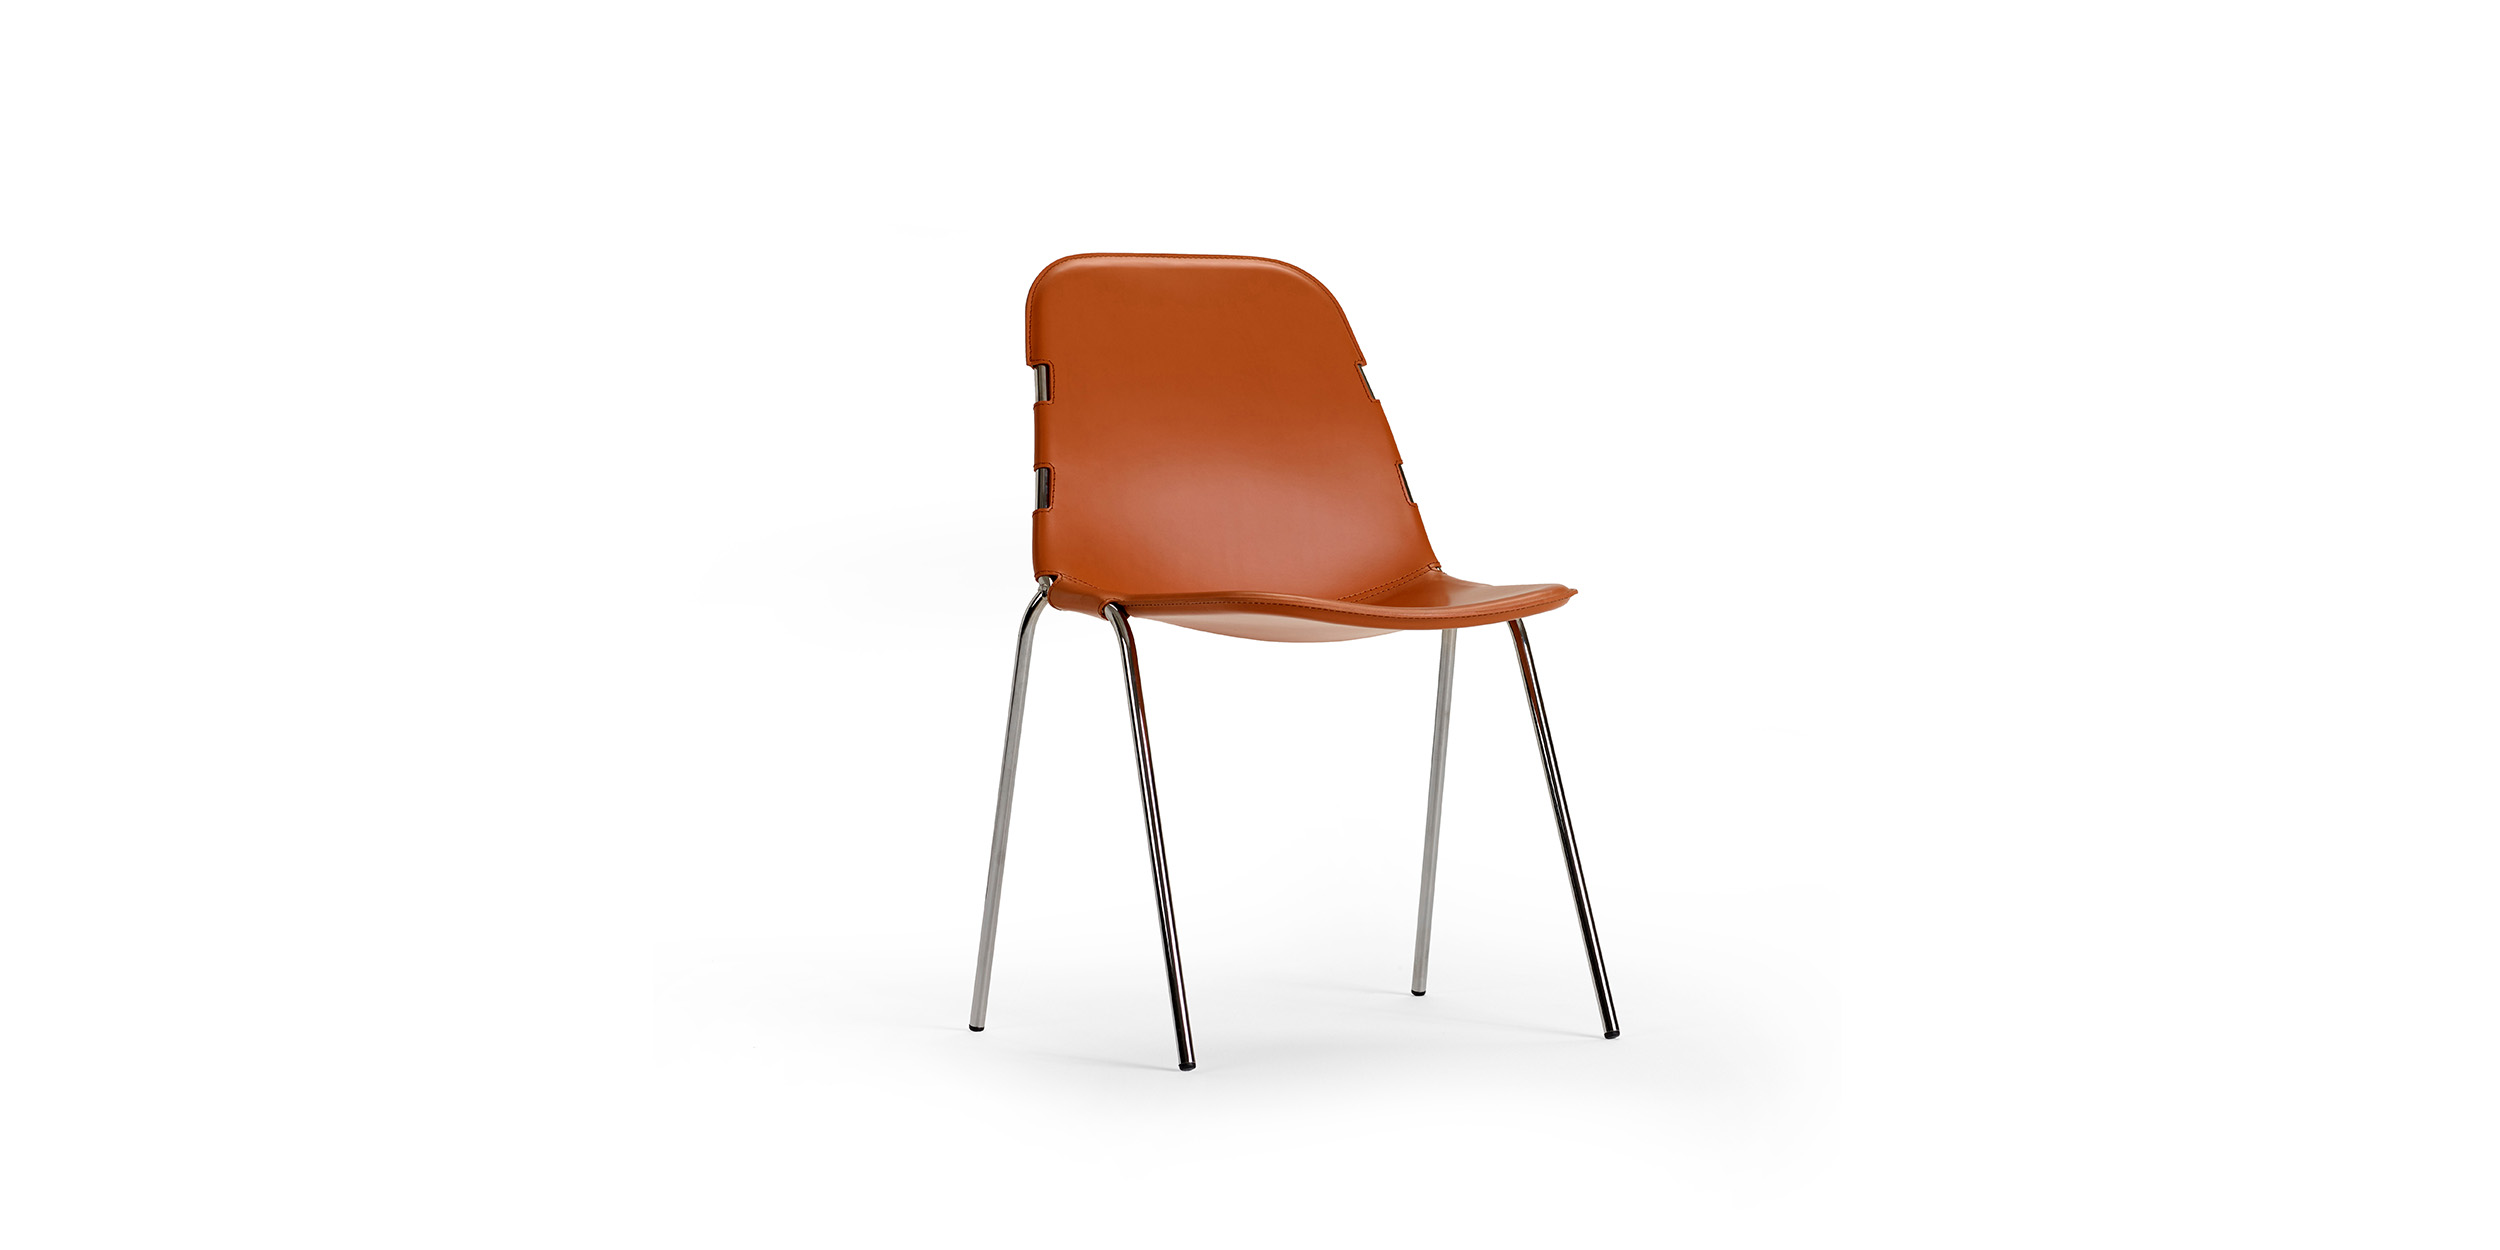 Bike, Chair by Monica Förster